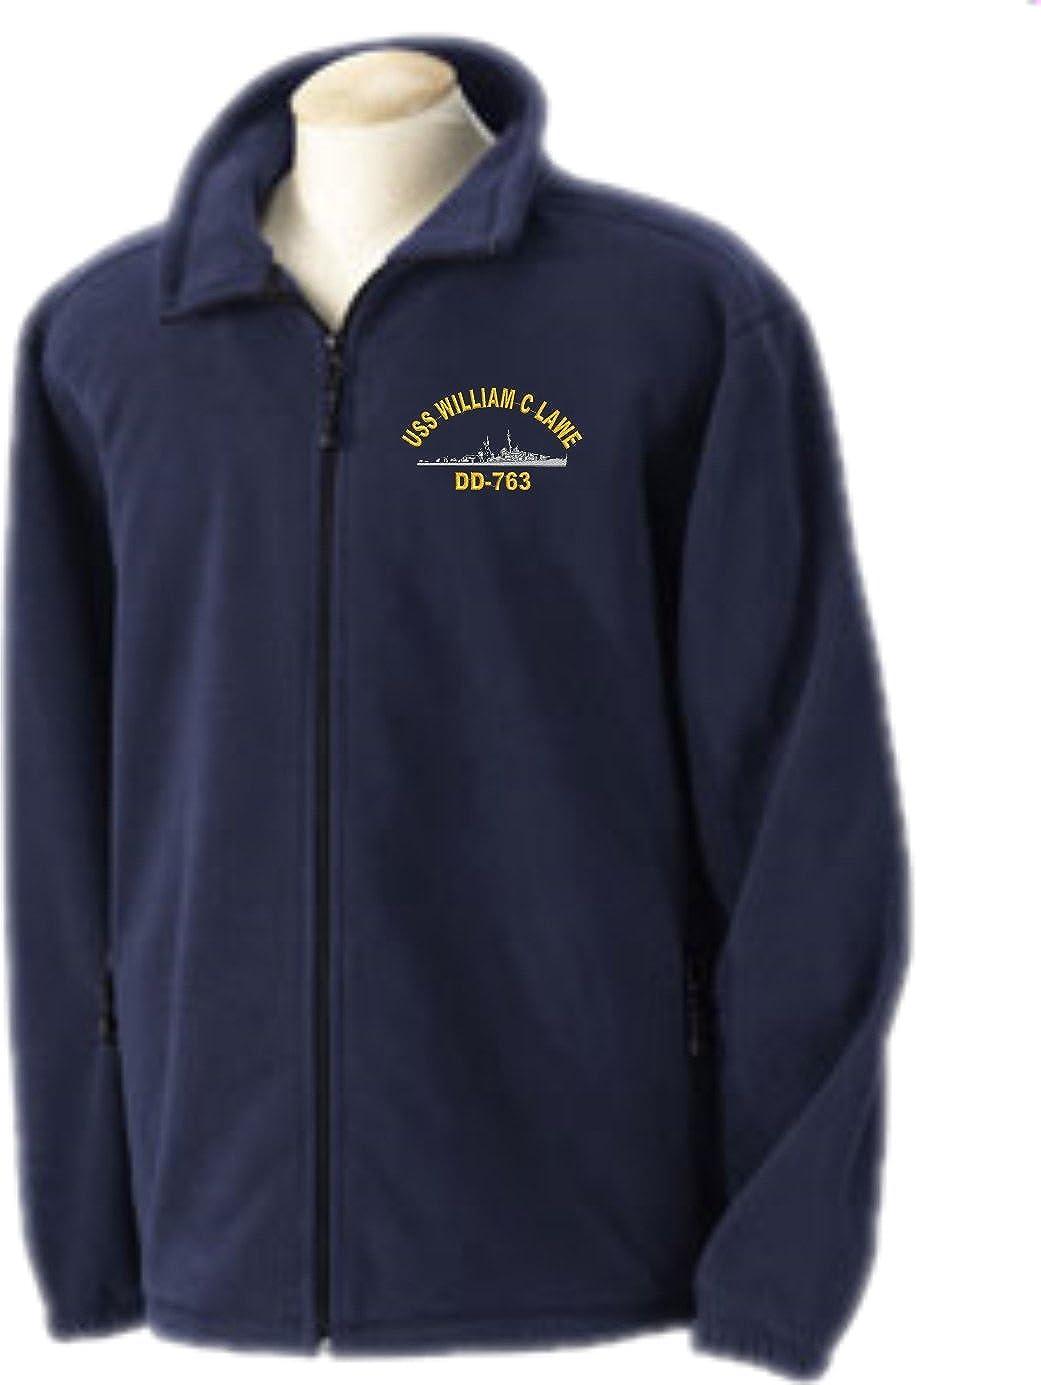 Lawe DD-763 Embroidered Fleece Jacket Sizes Small-4X Custom Military Apparel USS William C